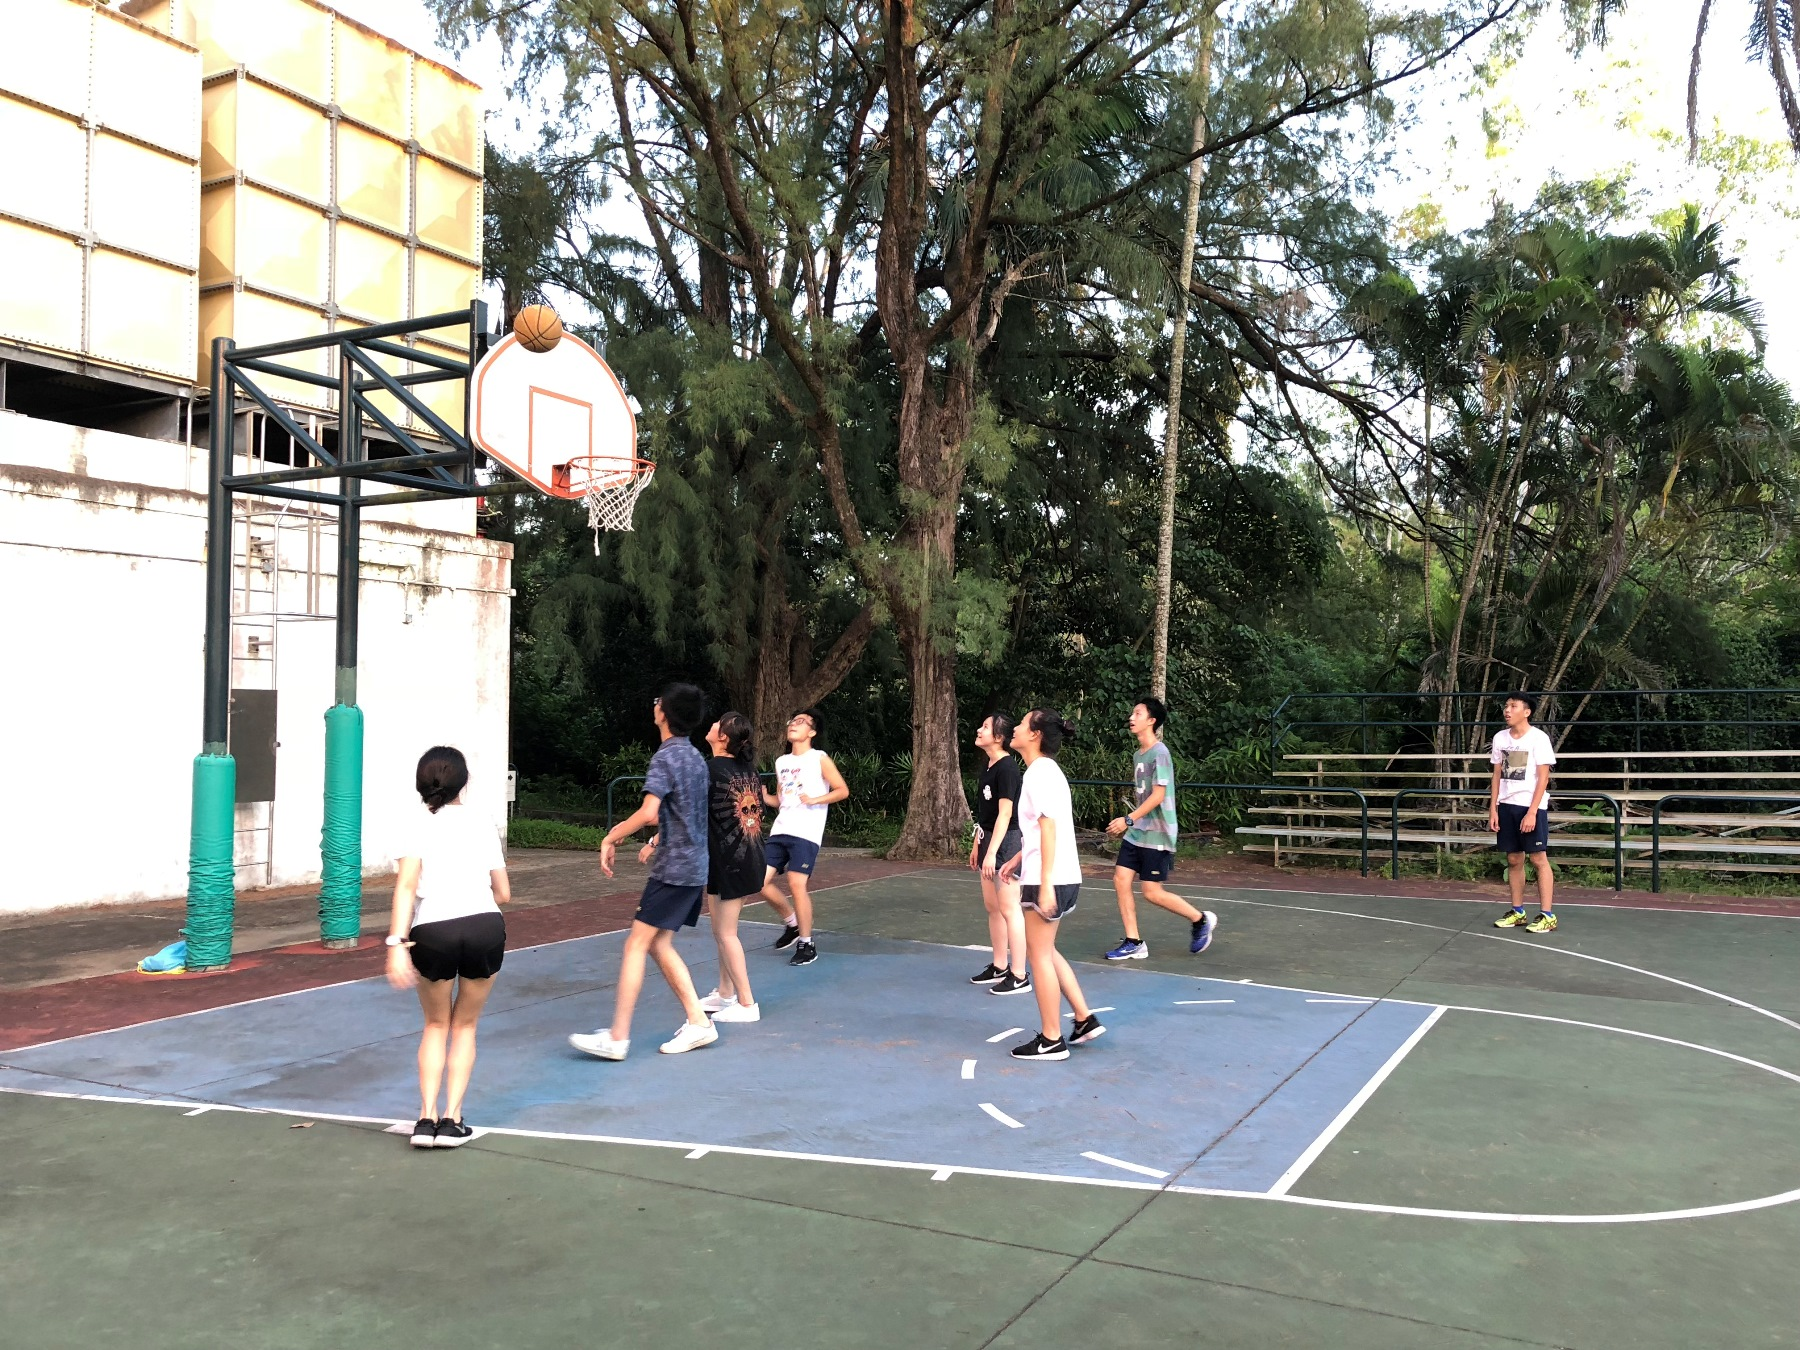 http://www.npc.edu.hk/sites/default/files/18_74.jpg